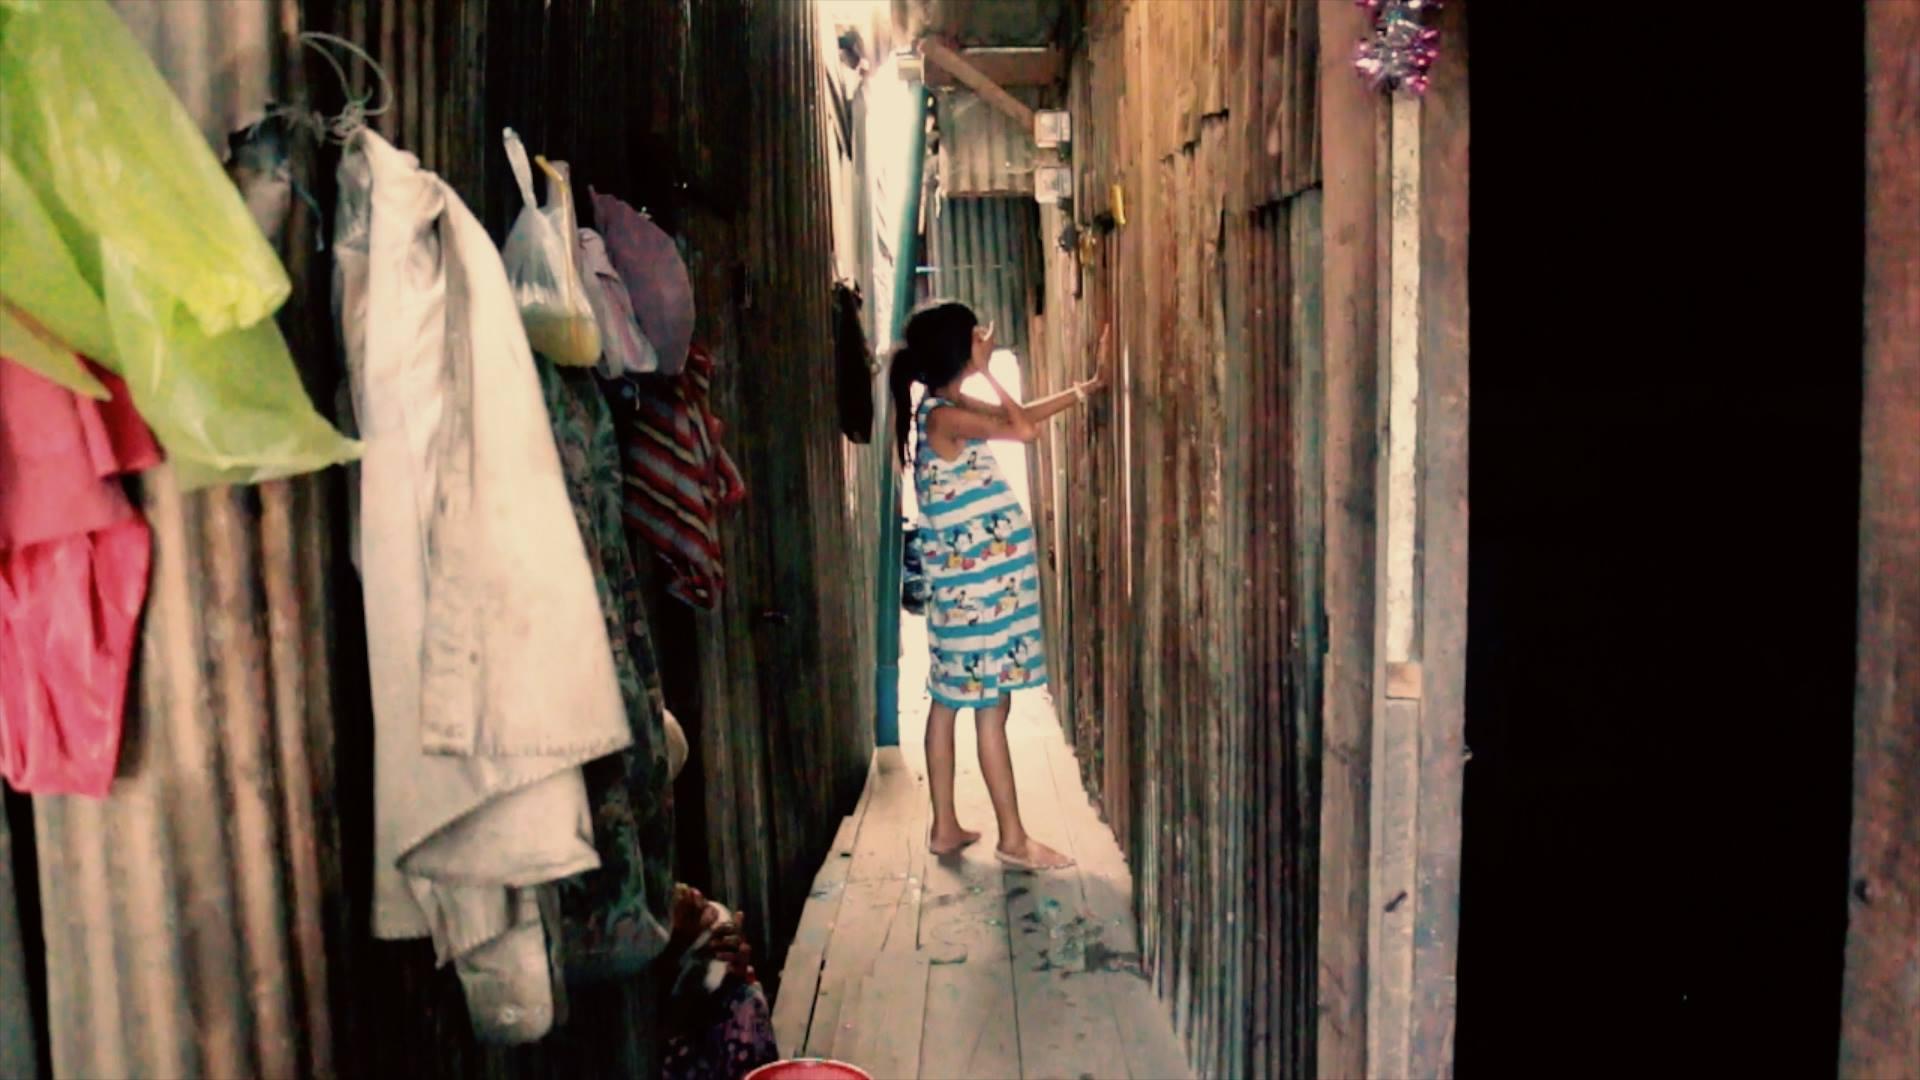 Sex worker in Phnom Penh